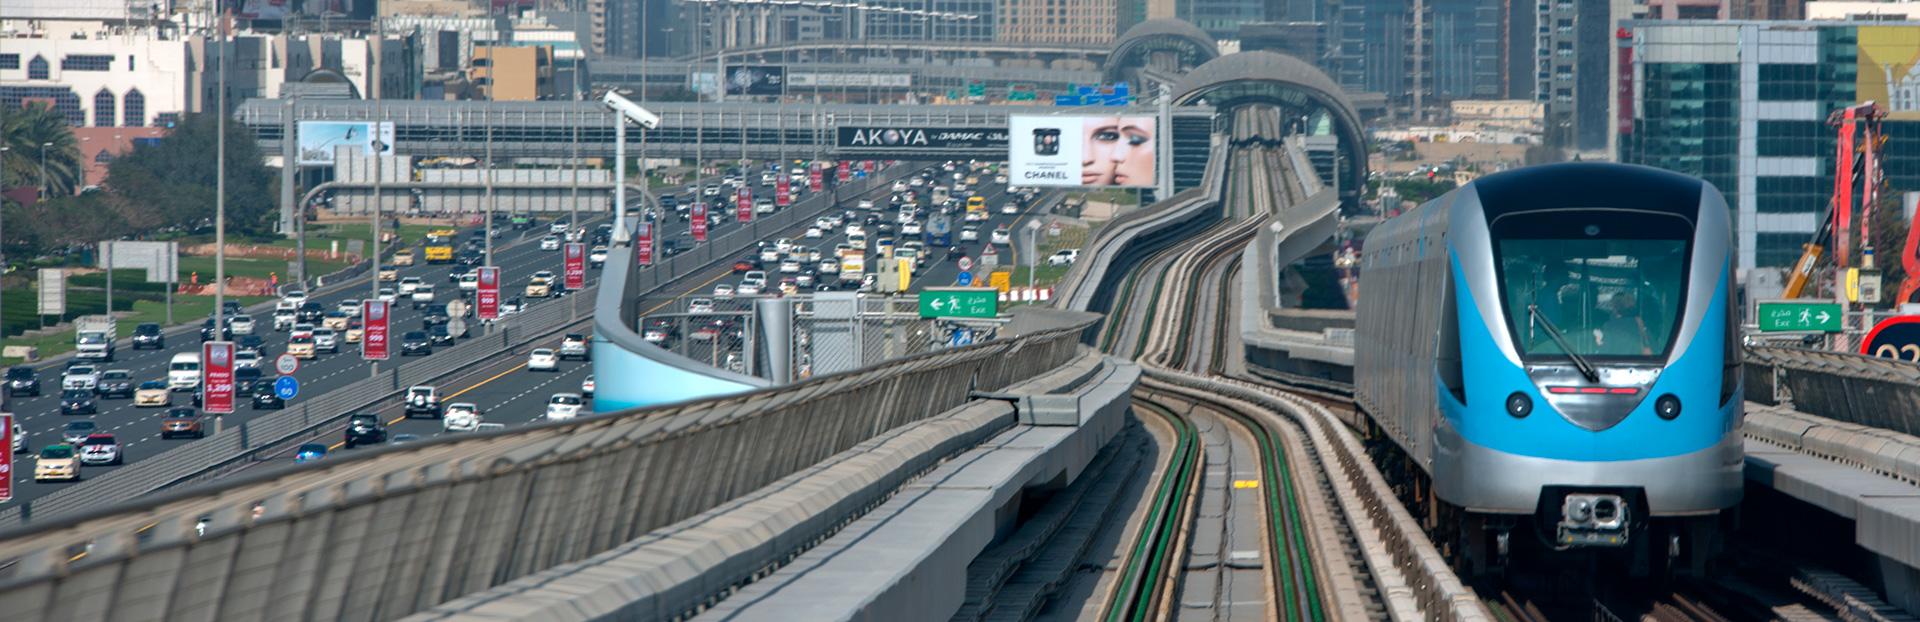 Dubai audio tour: 地铁时光:从哈利法塔去往迪拜老城区